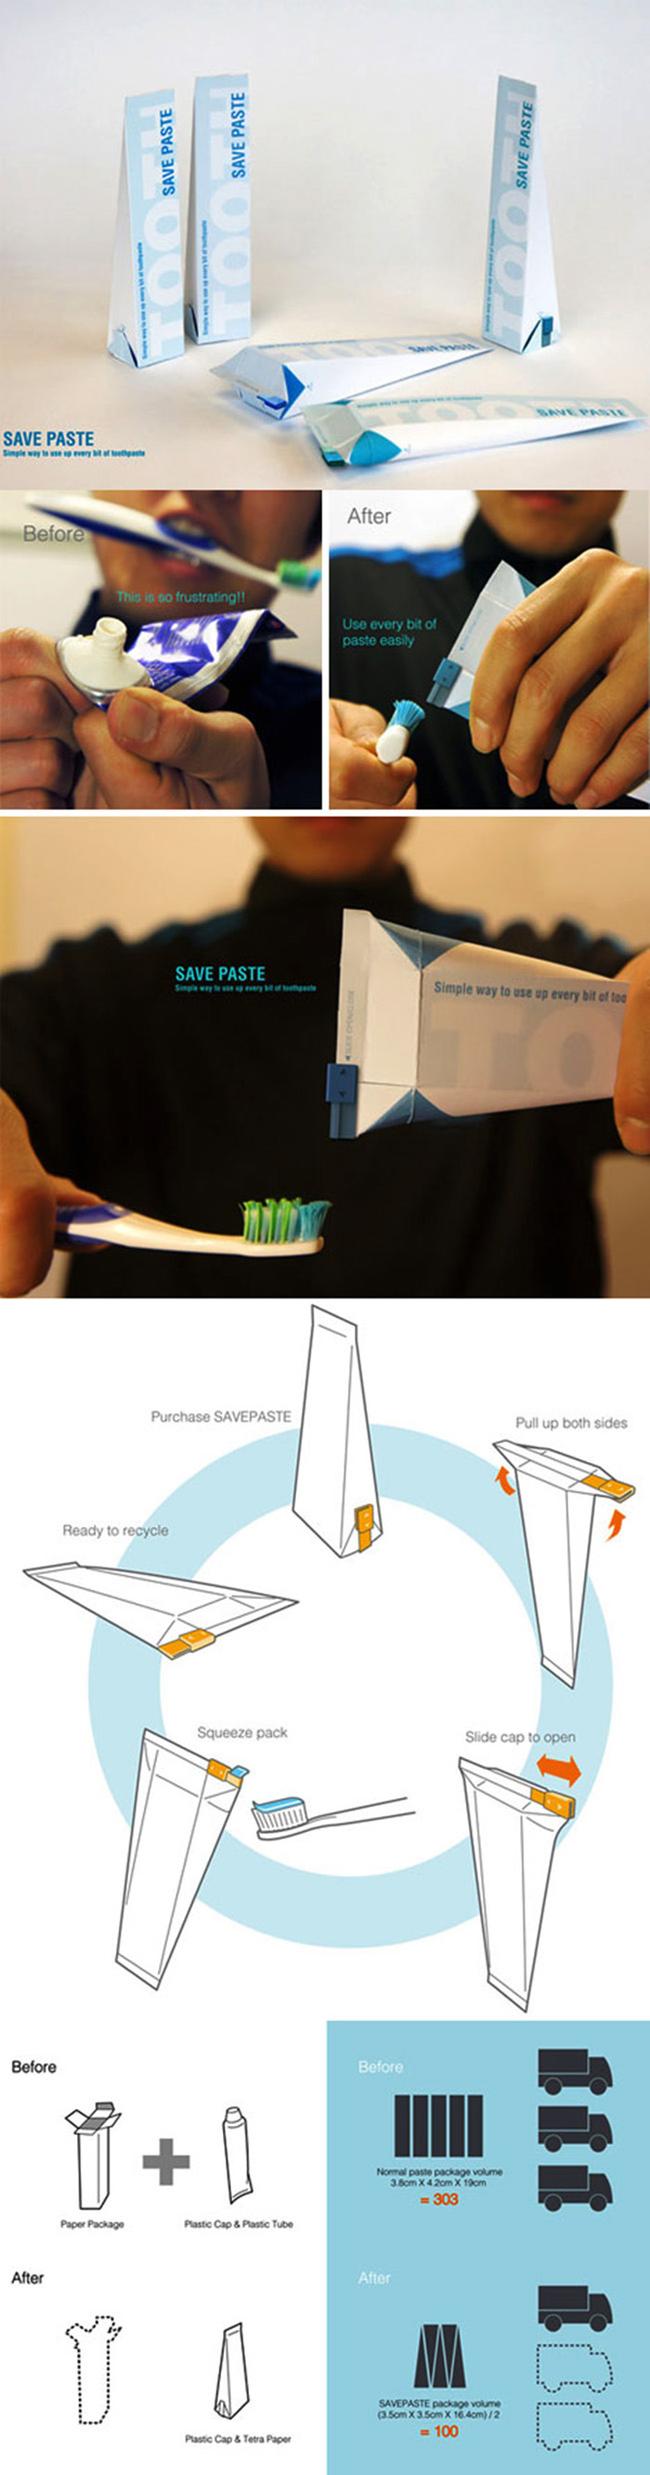 6.) This waste-free toothpaste revolution.